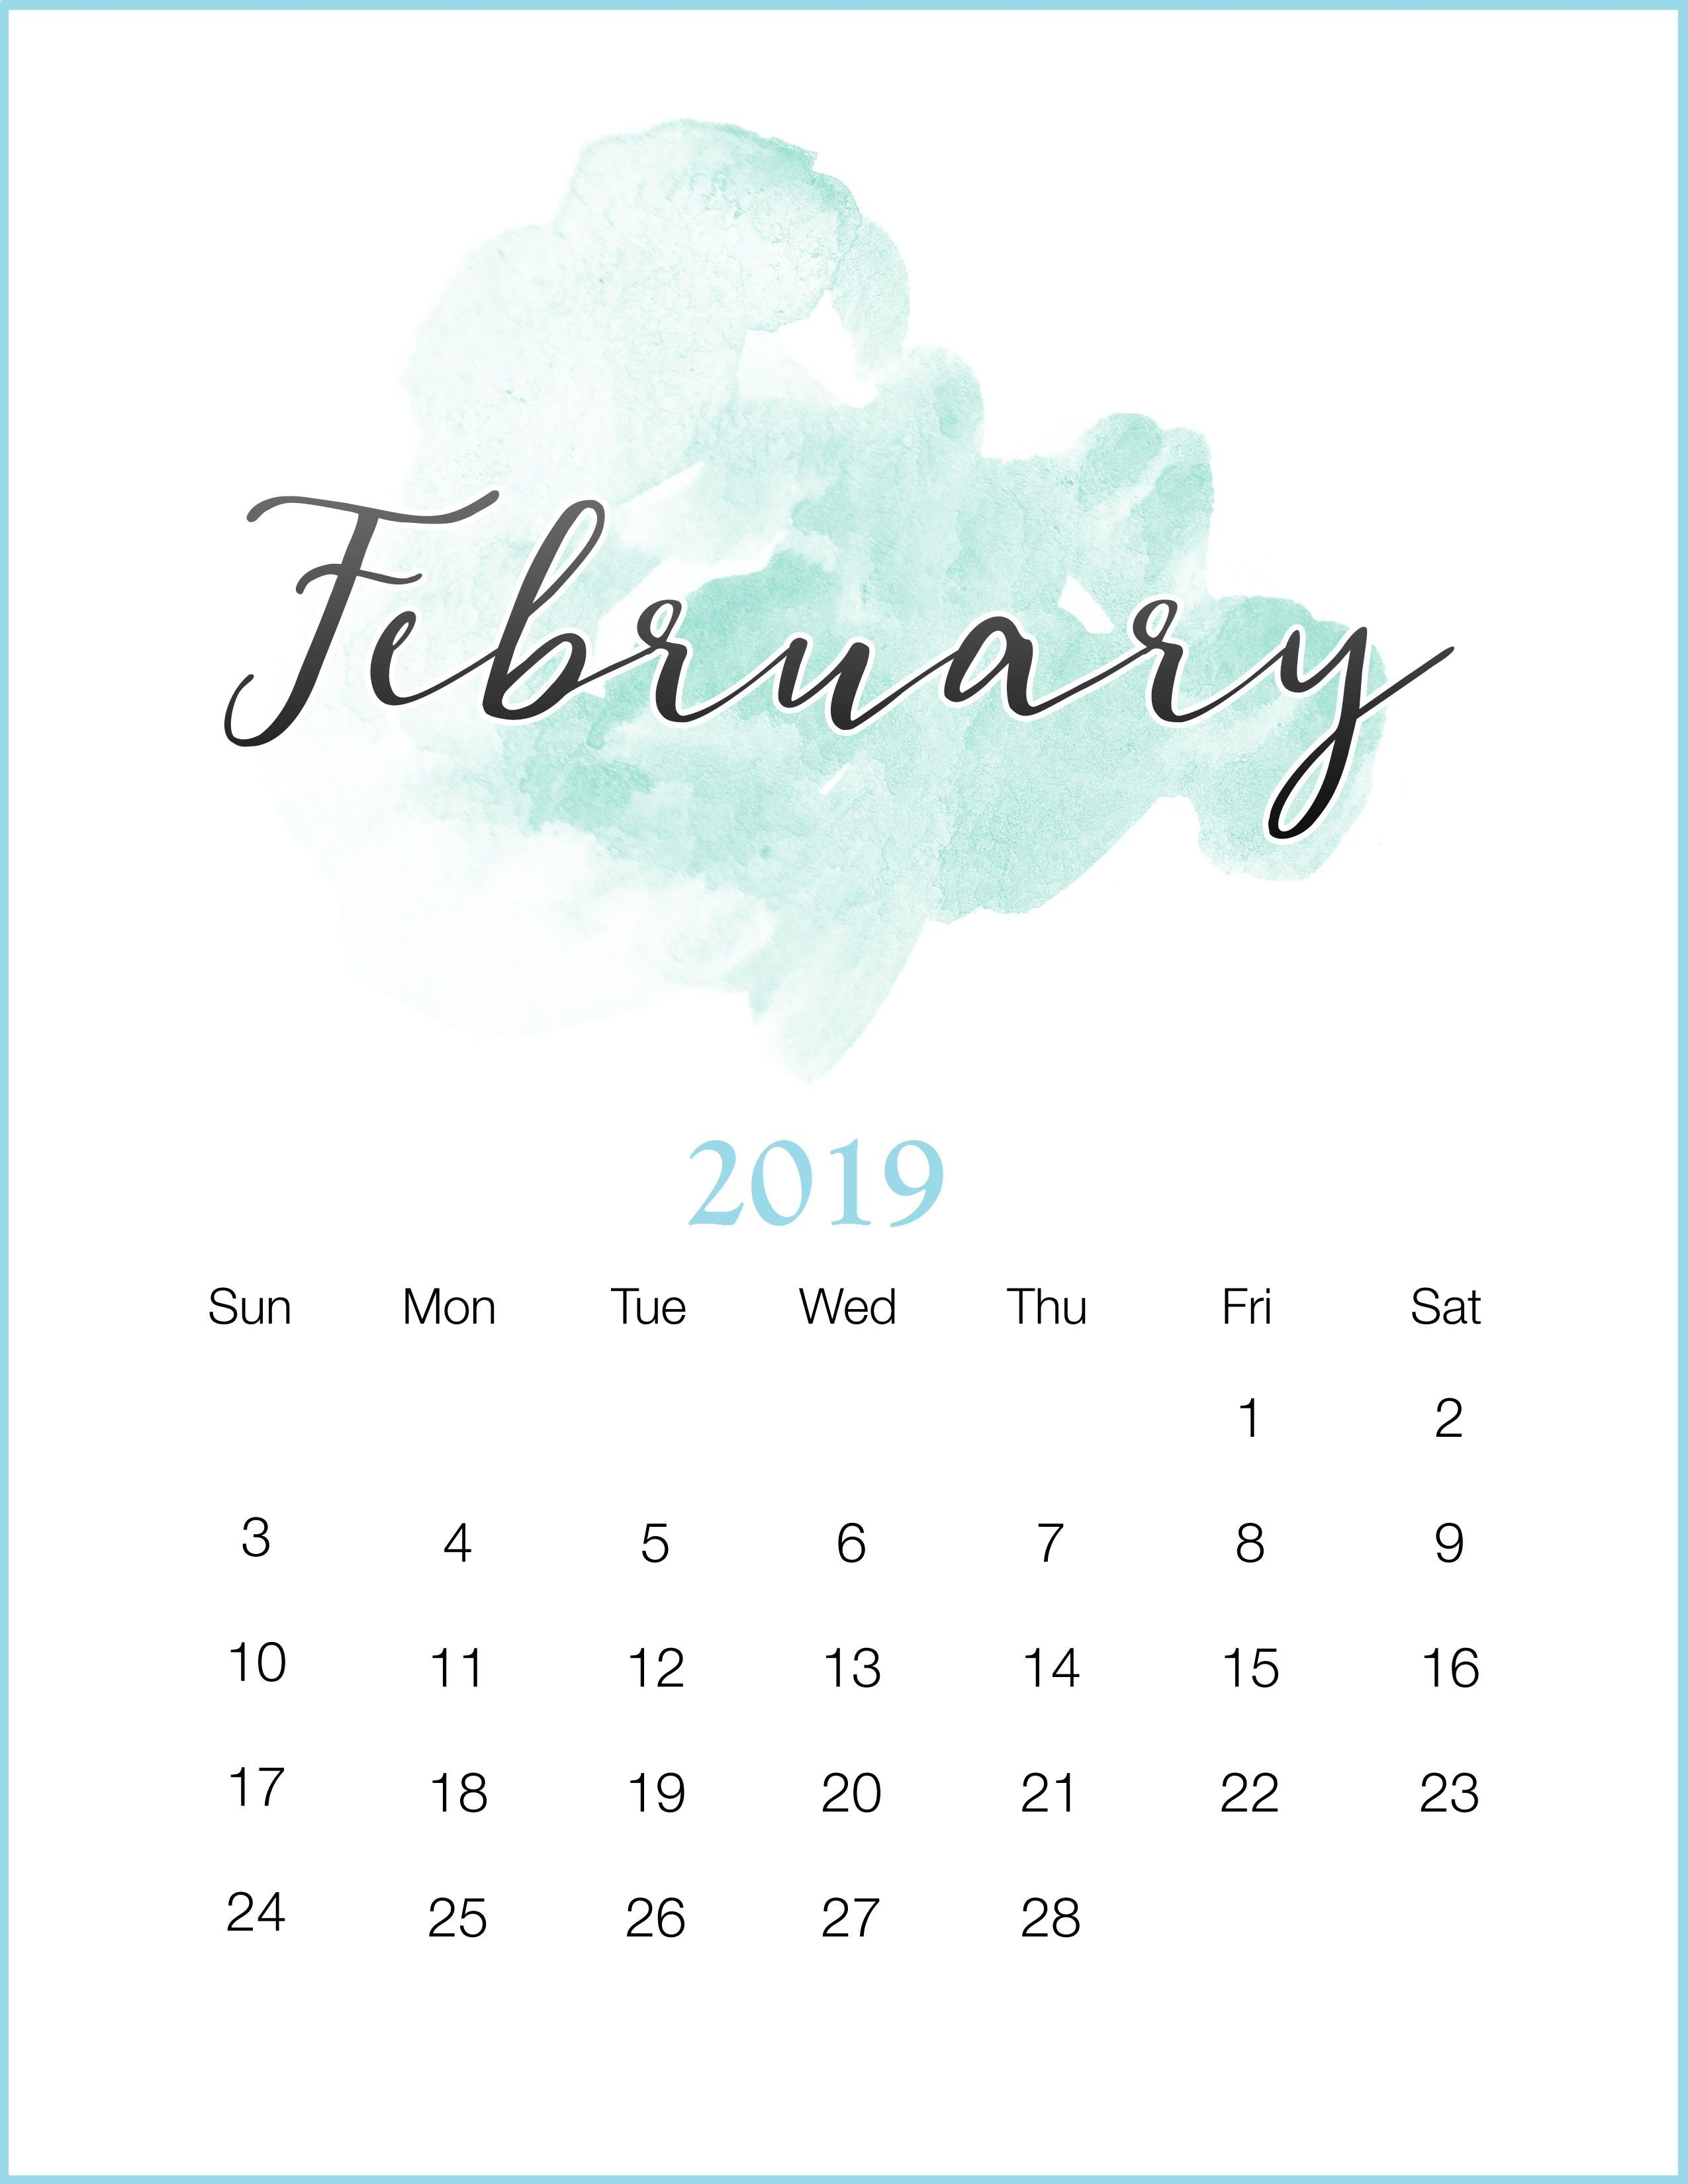 Watercolor 2019 February Printable Calendar #february2019 Calendar 2019 Diy